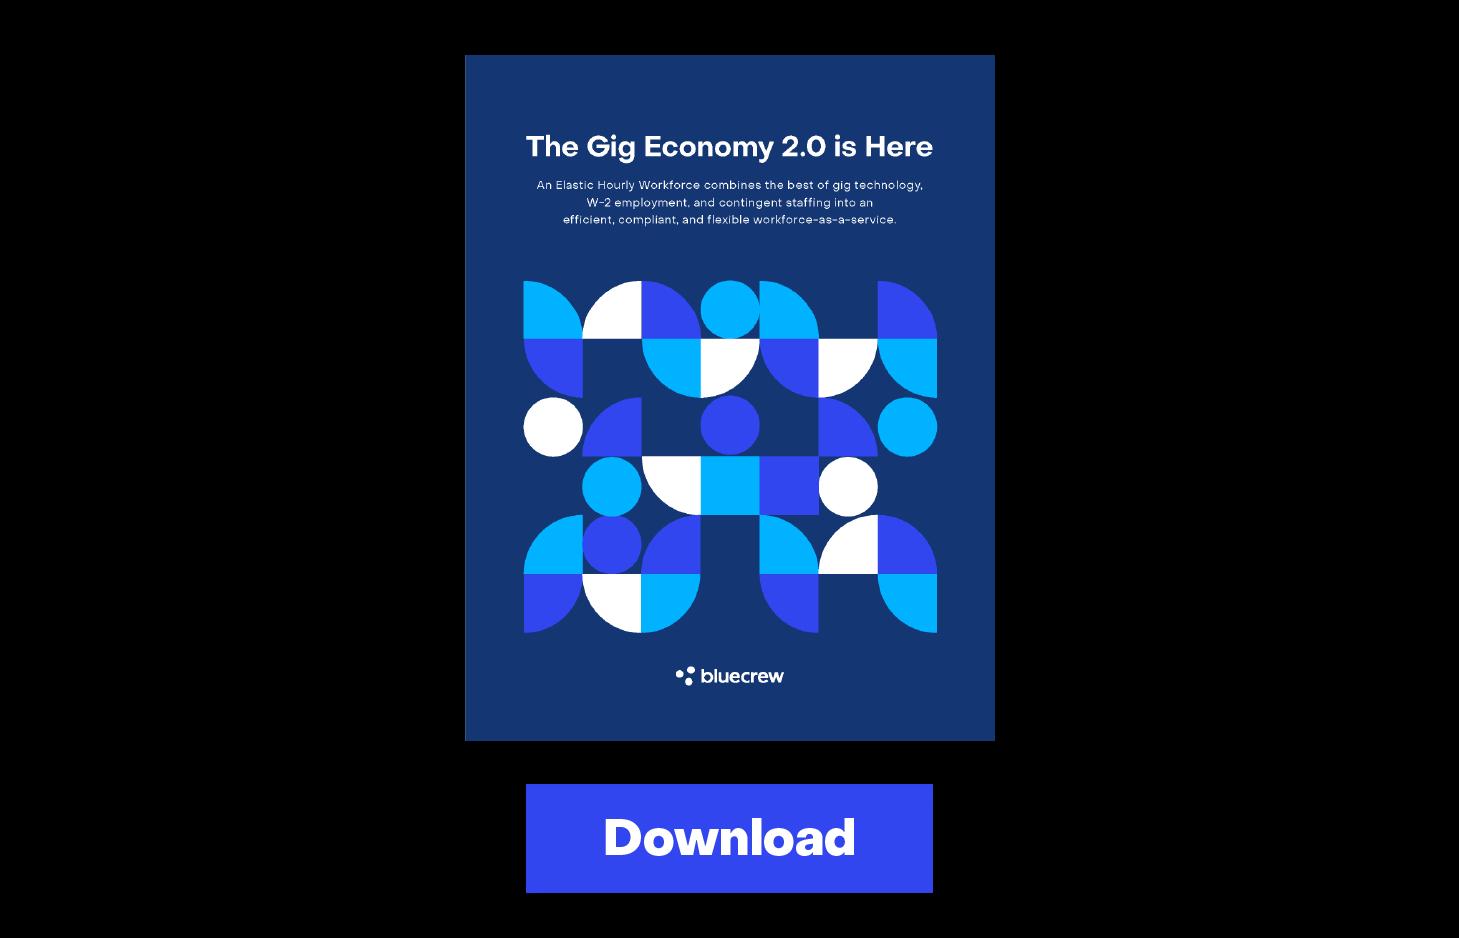 Gig Economy 2.0